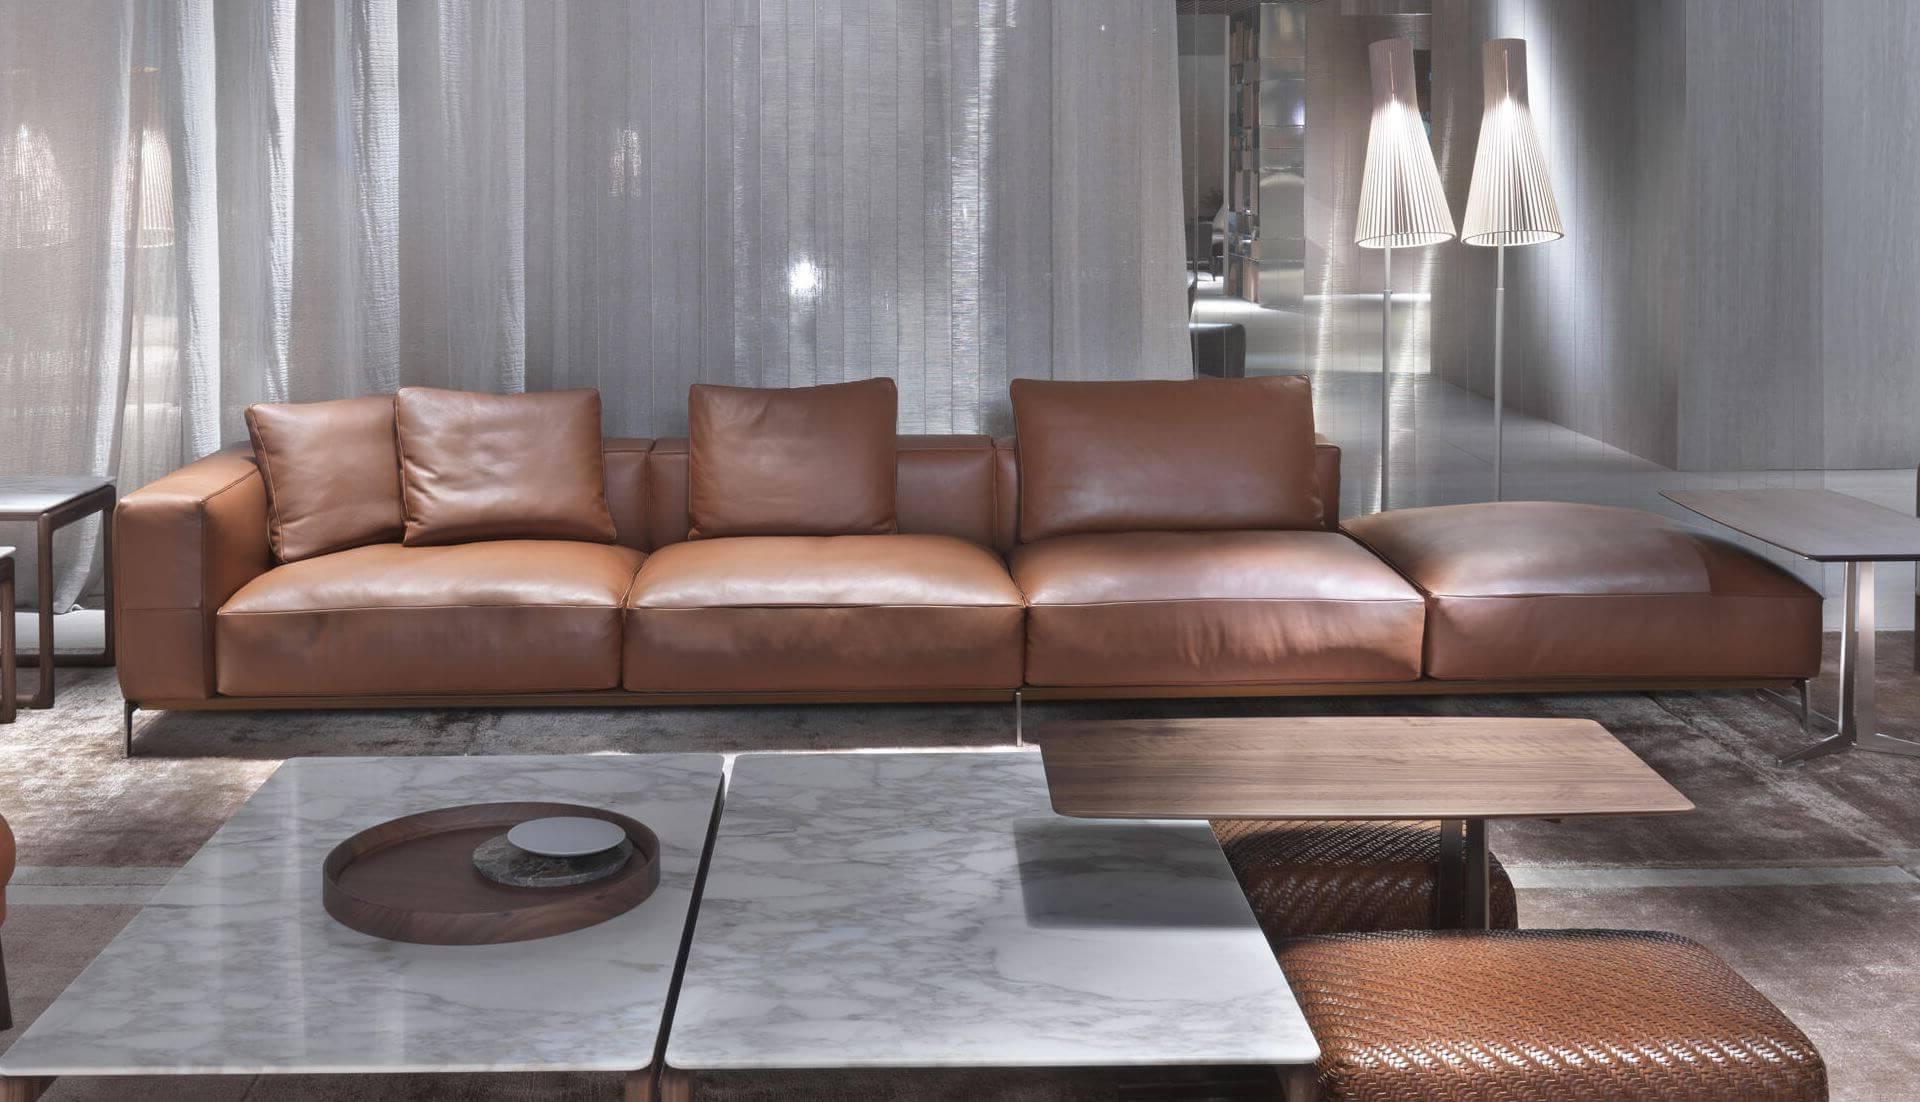 Dream Navy 3 Piece Modular Sofas Within Well Known Flexform Ettore Modular Sofa – Dream Design Interiors Ltd (View 20 of 20)